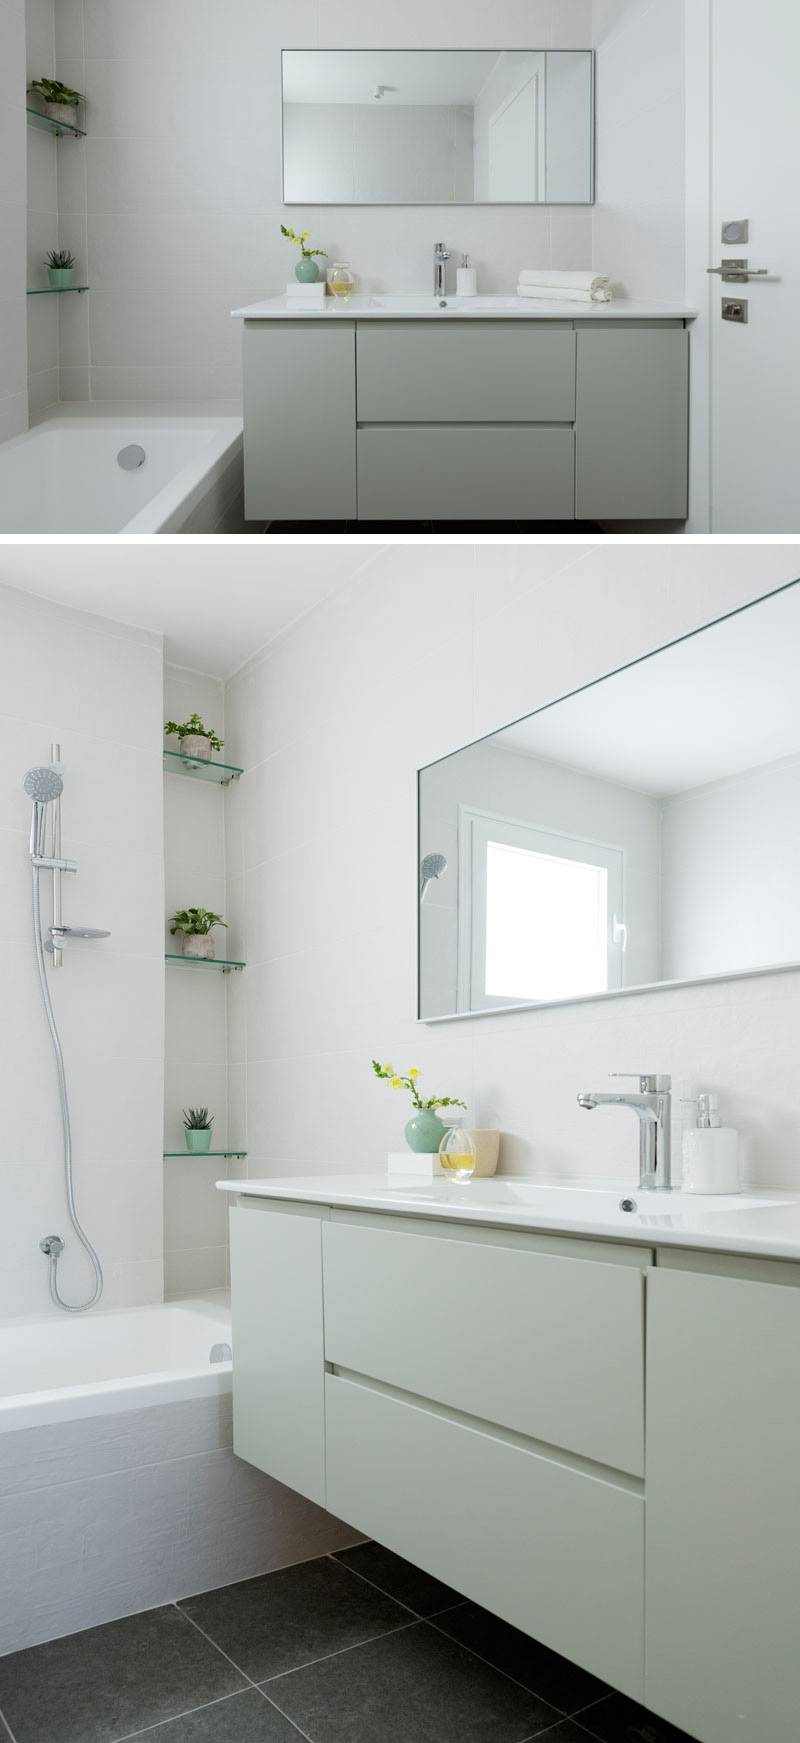 Bathroom Mint Green Cabinets 140617 448